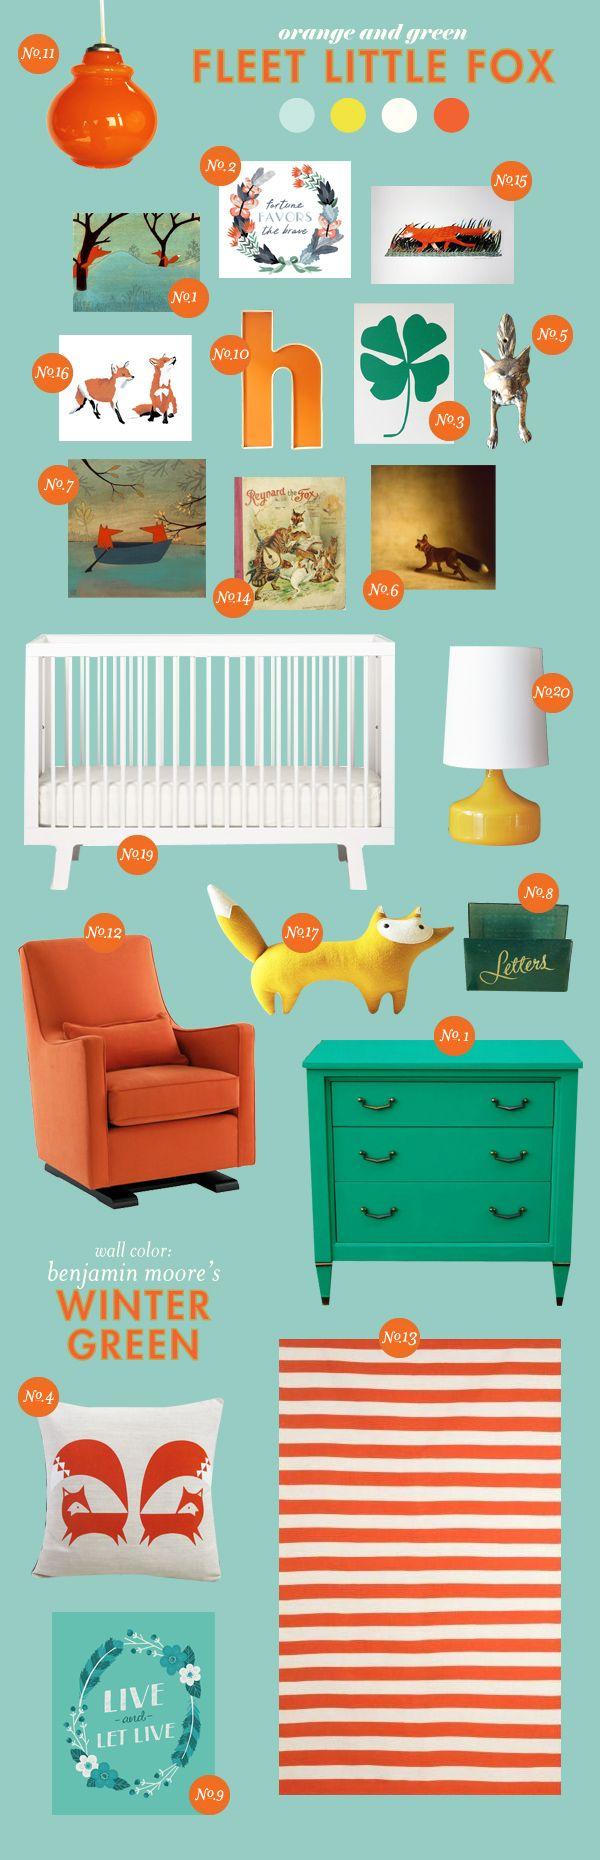 fleet little fox: Nurseries Inspiration, Boys Nurseries, Foxes Theme, Foxes Nurseries, Inspiration Boards, Colors Schemes, Baby Rooms, Nurseries Ideas, Baby Nurseries